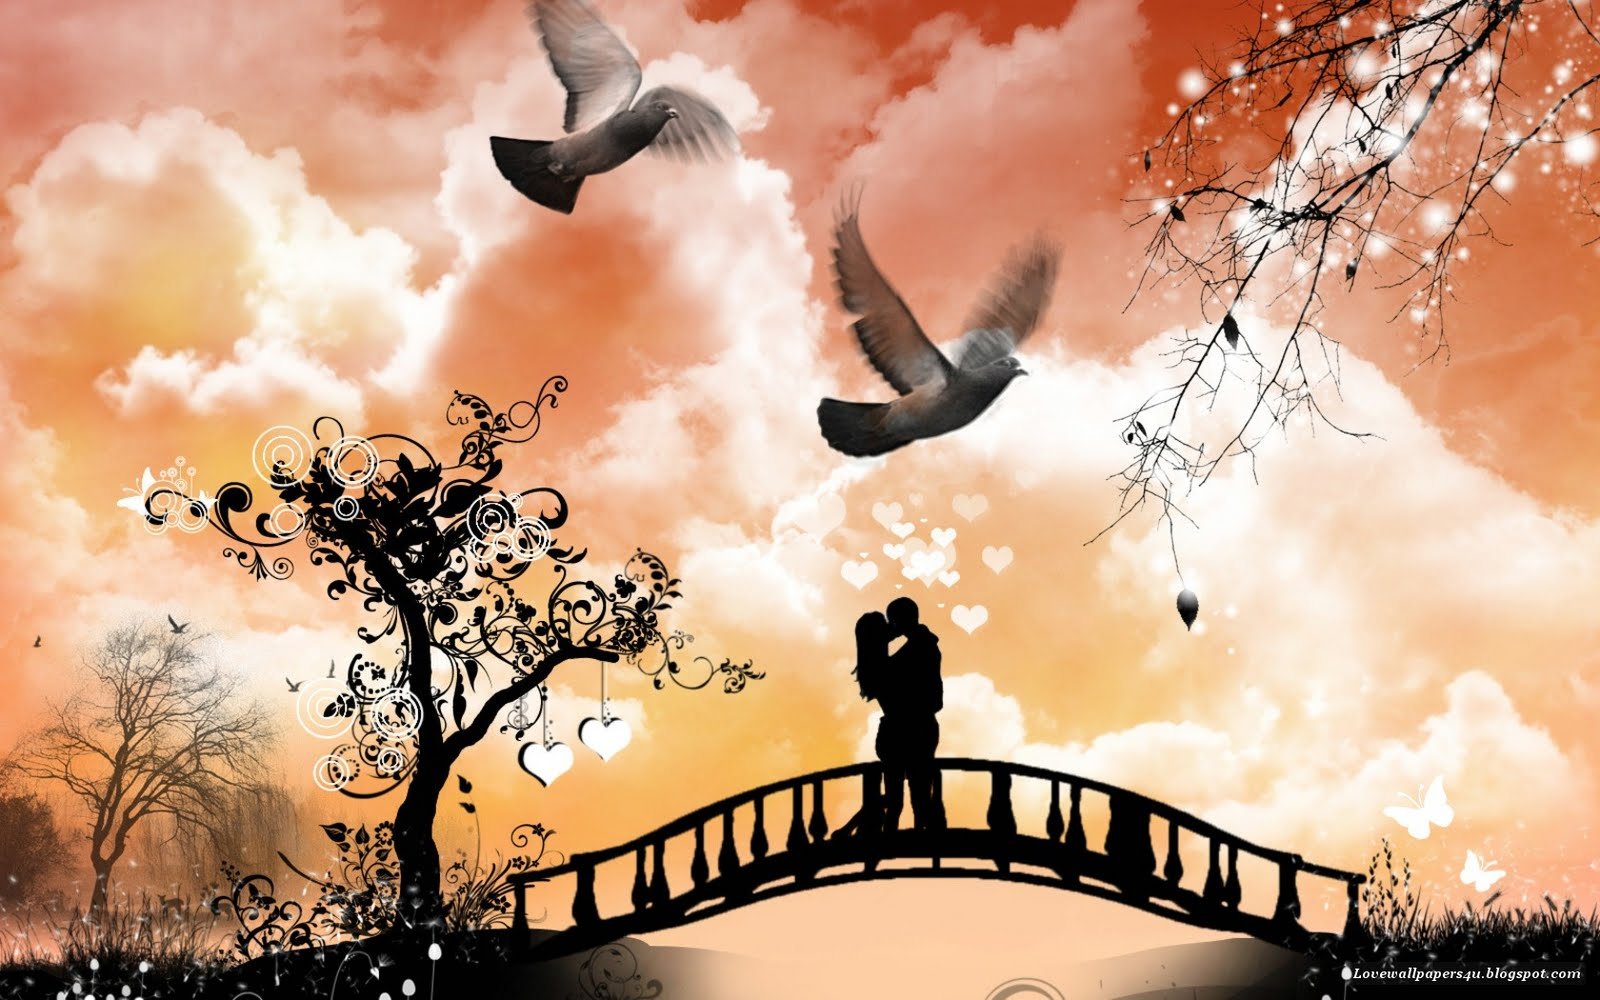 http://4.bp.blogspot.com/-bqe0hYKpXUU/Tn9Dtf85KJI/AAAAAAAABZI/caO3ZRbltrs/s1600/Spring-love.jpg